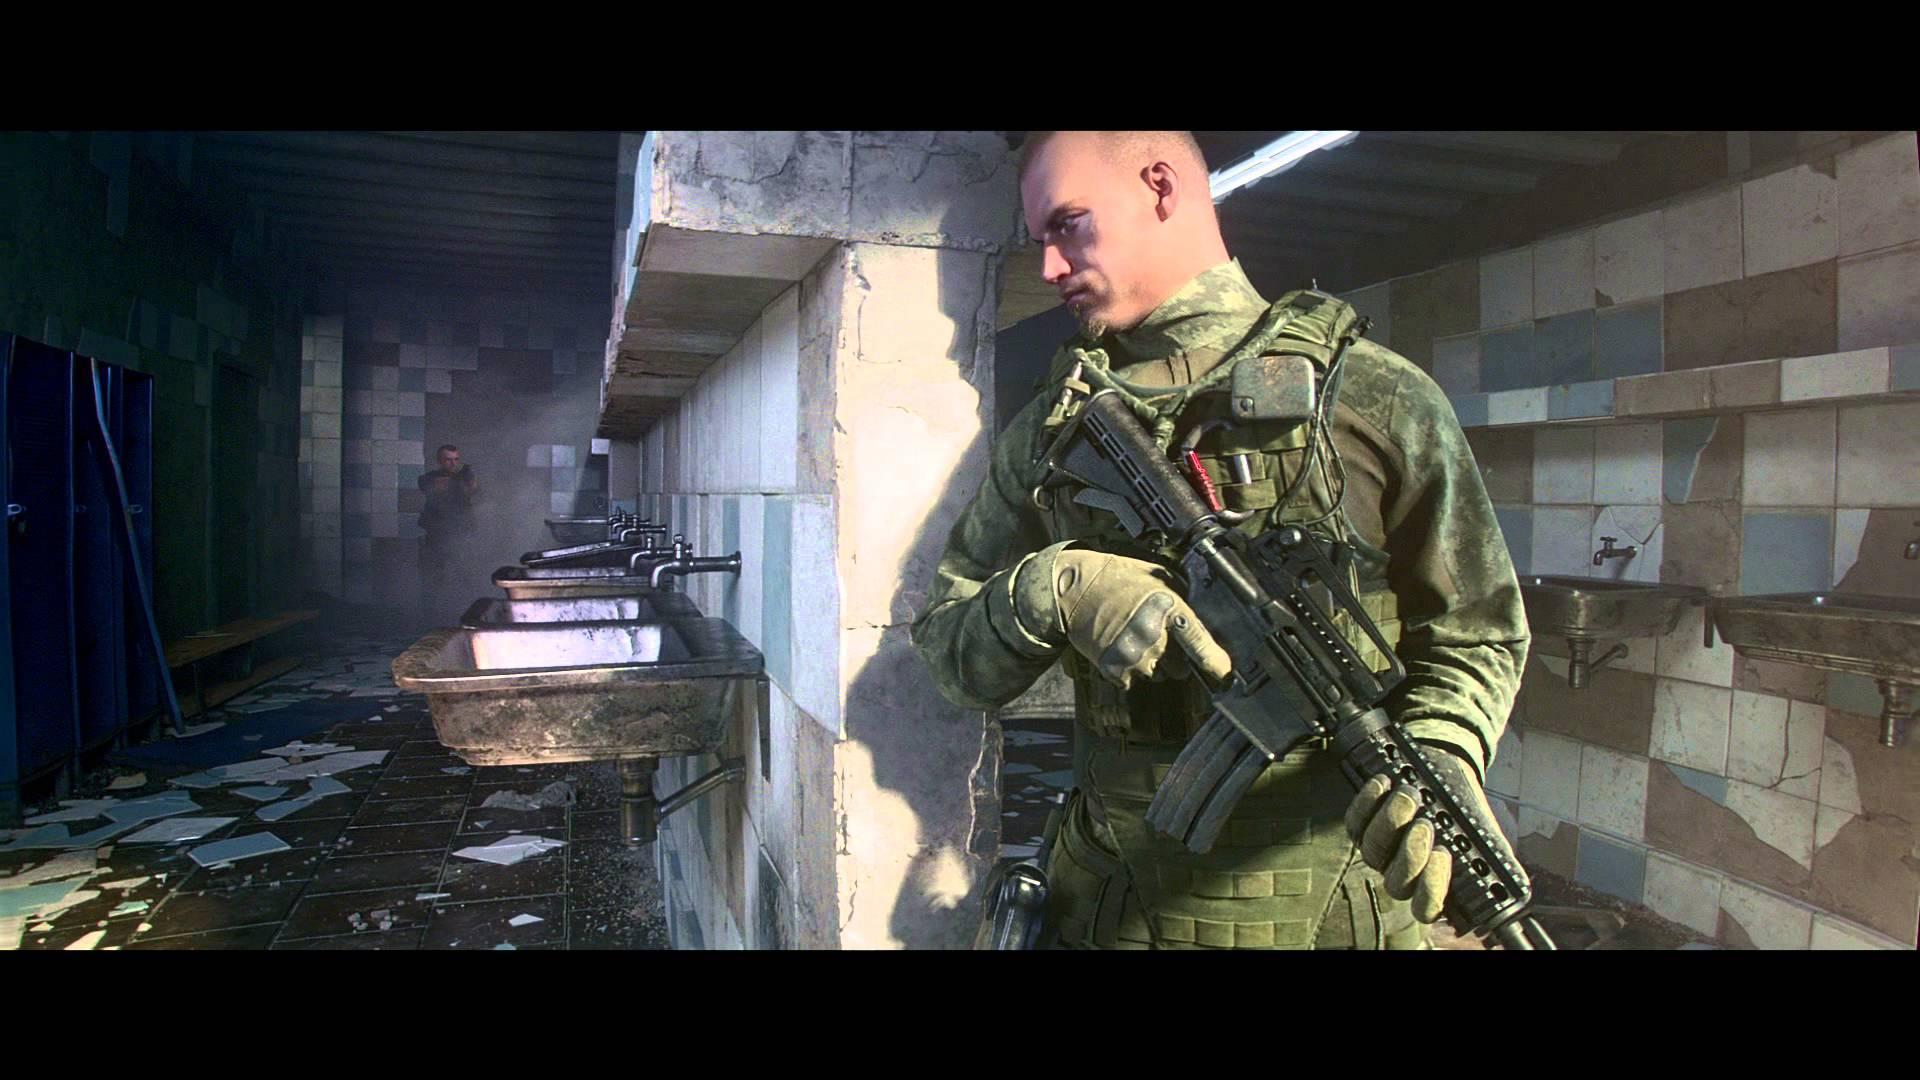 wallpaper help - General game forum - Escape from Tarkov Forum